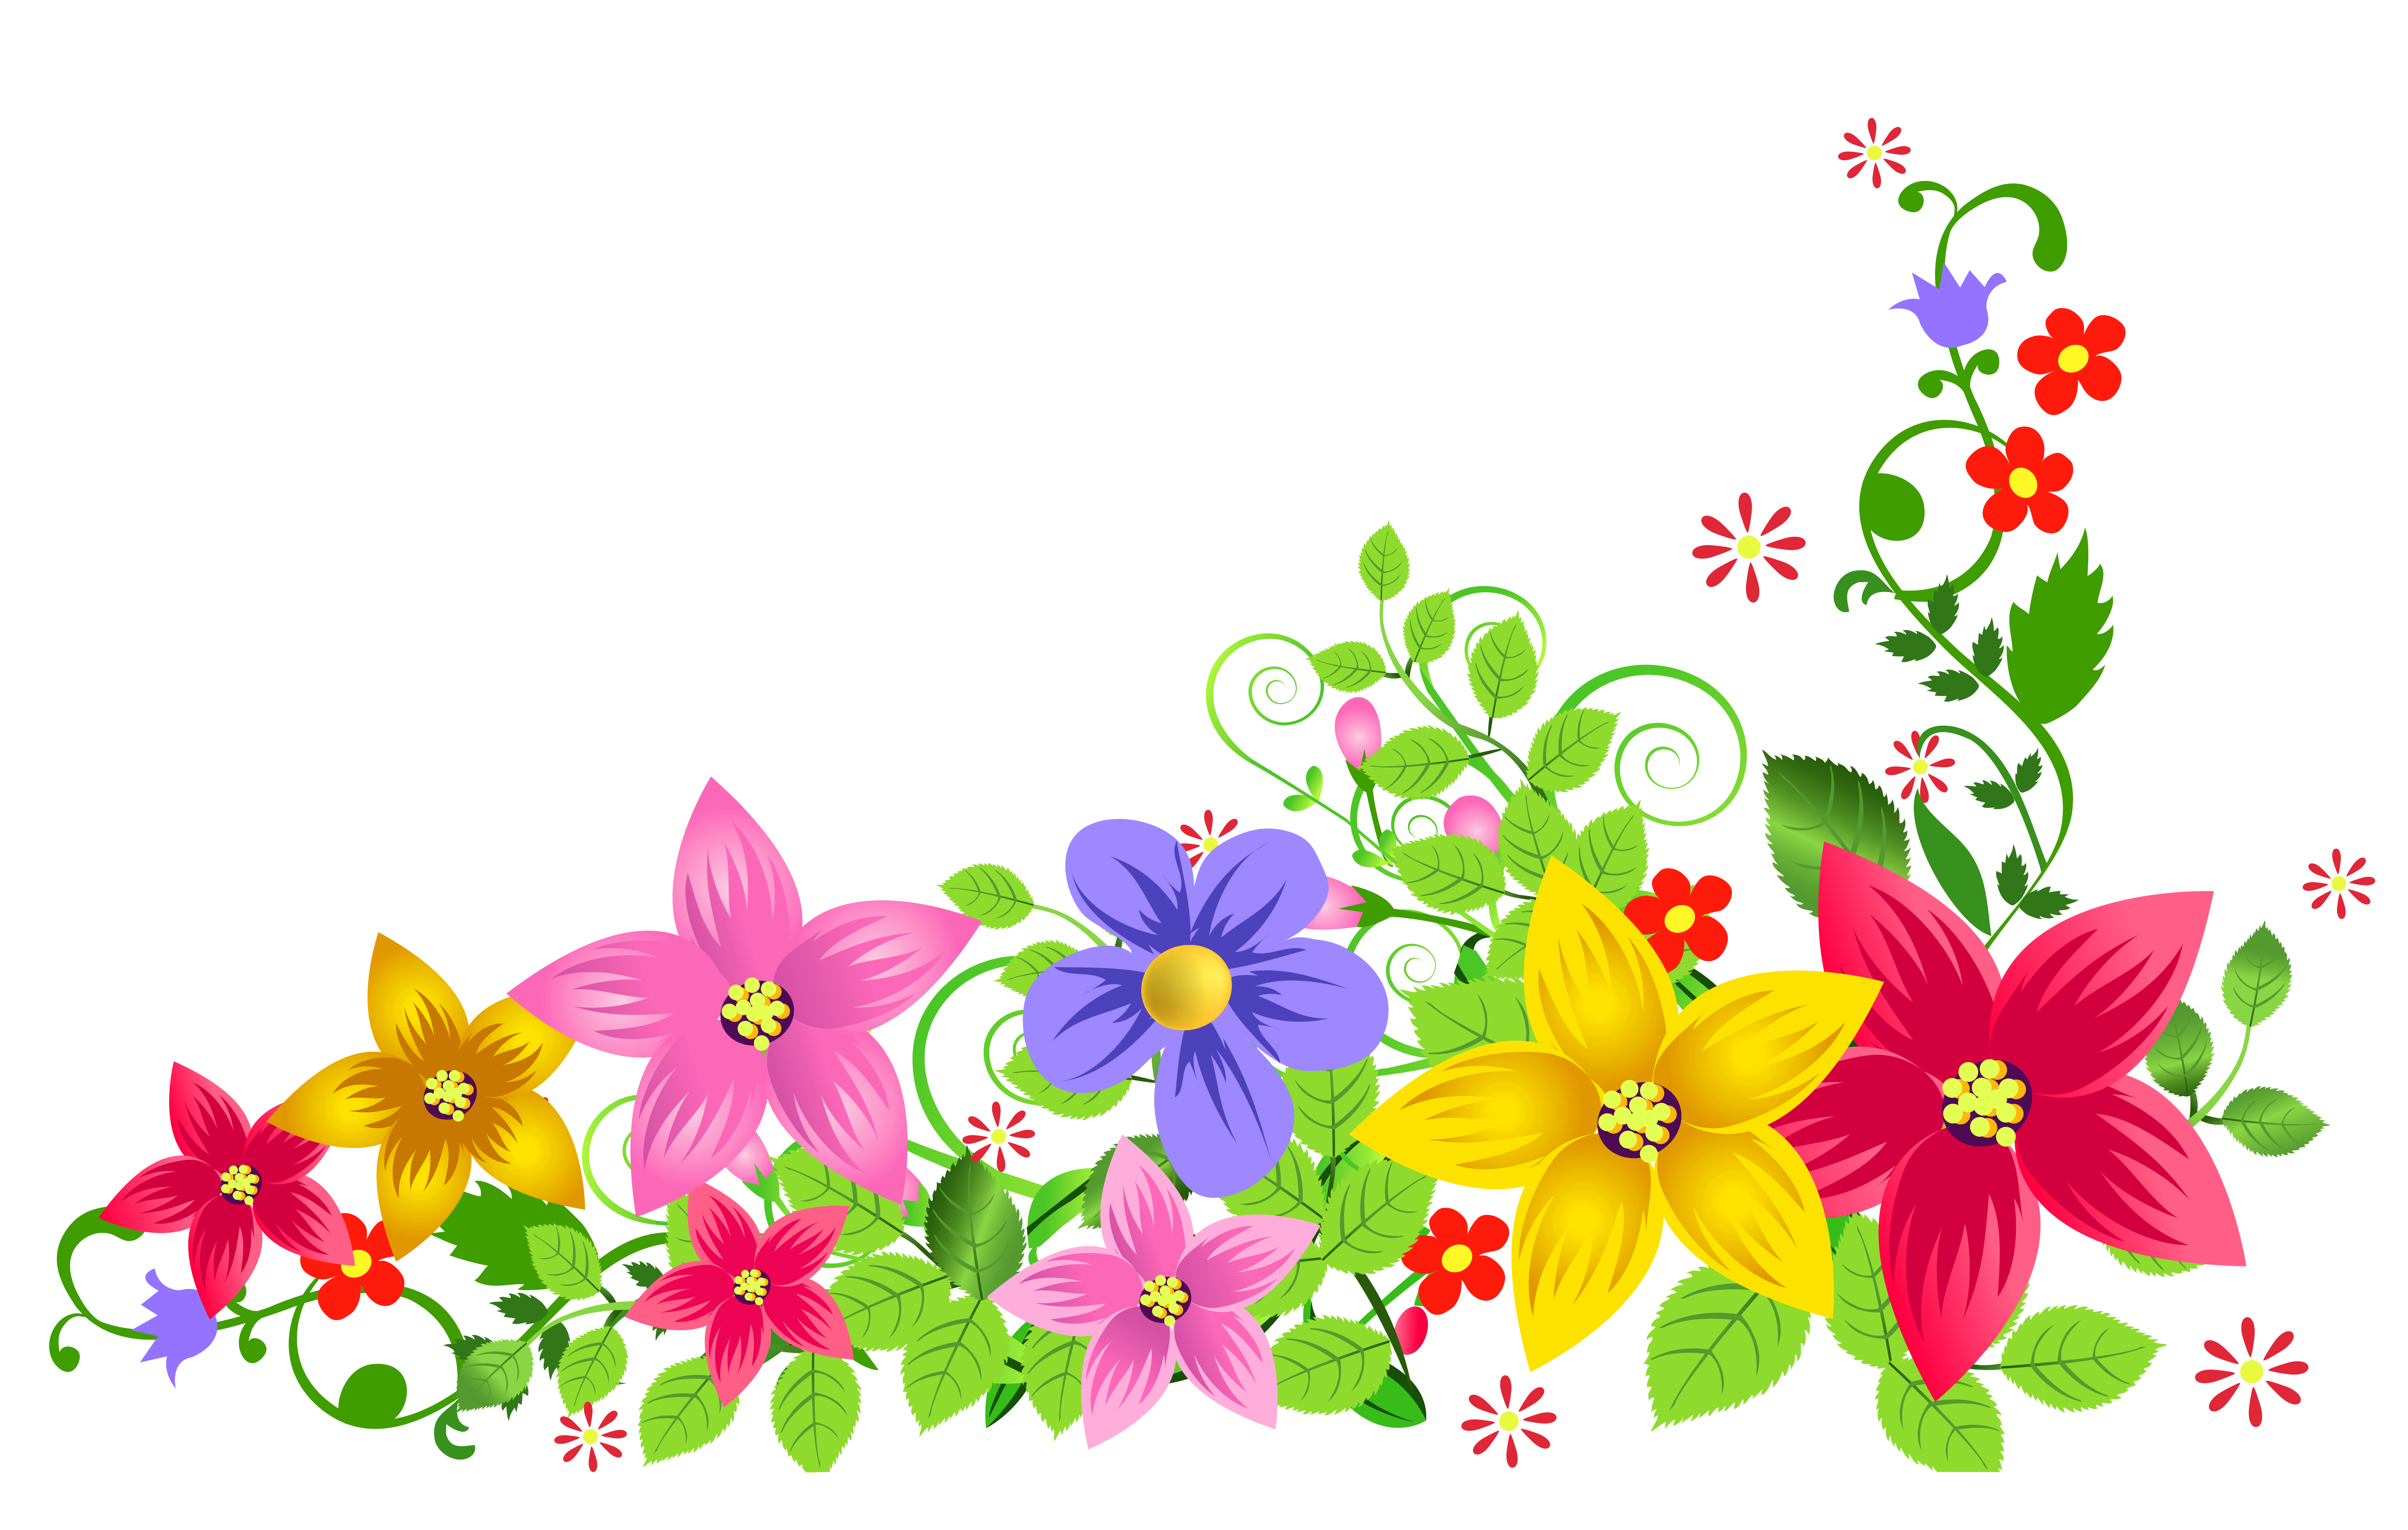 Floral transparent images pluspng. Flower background png